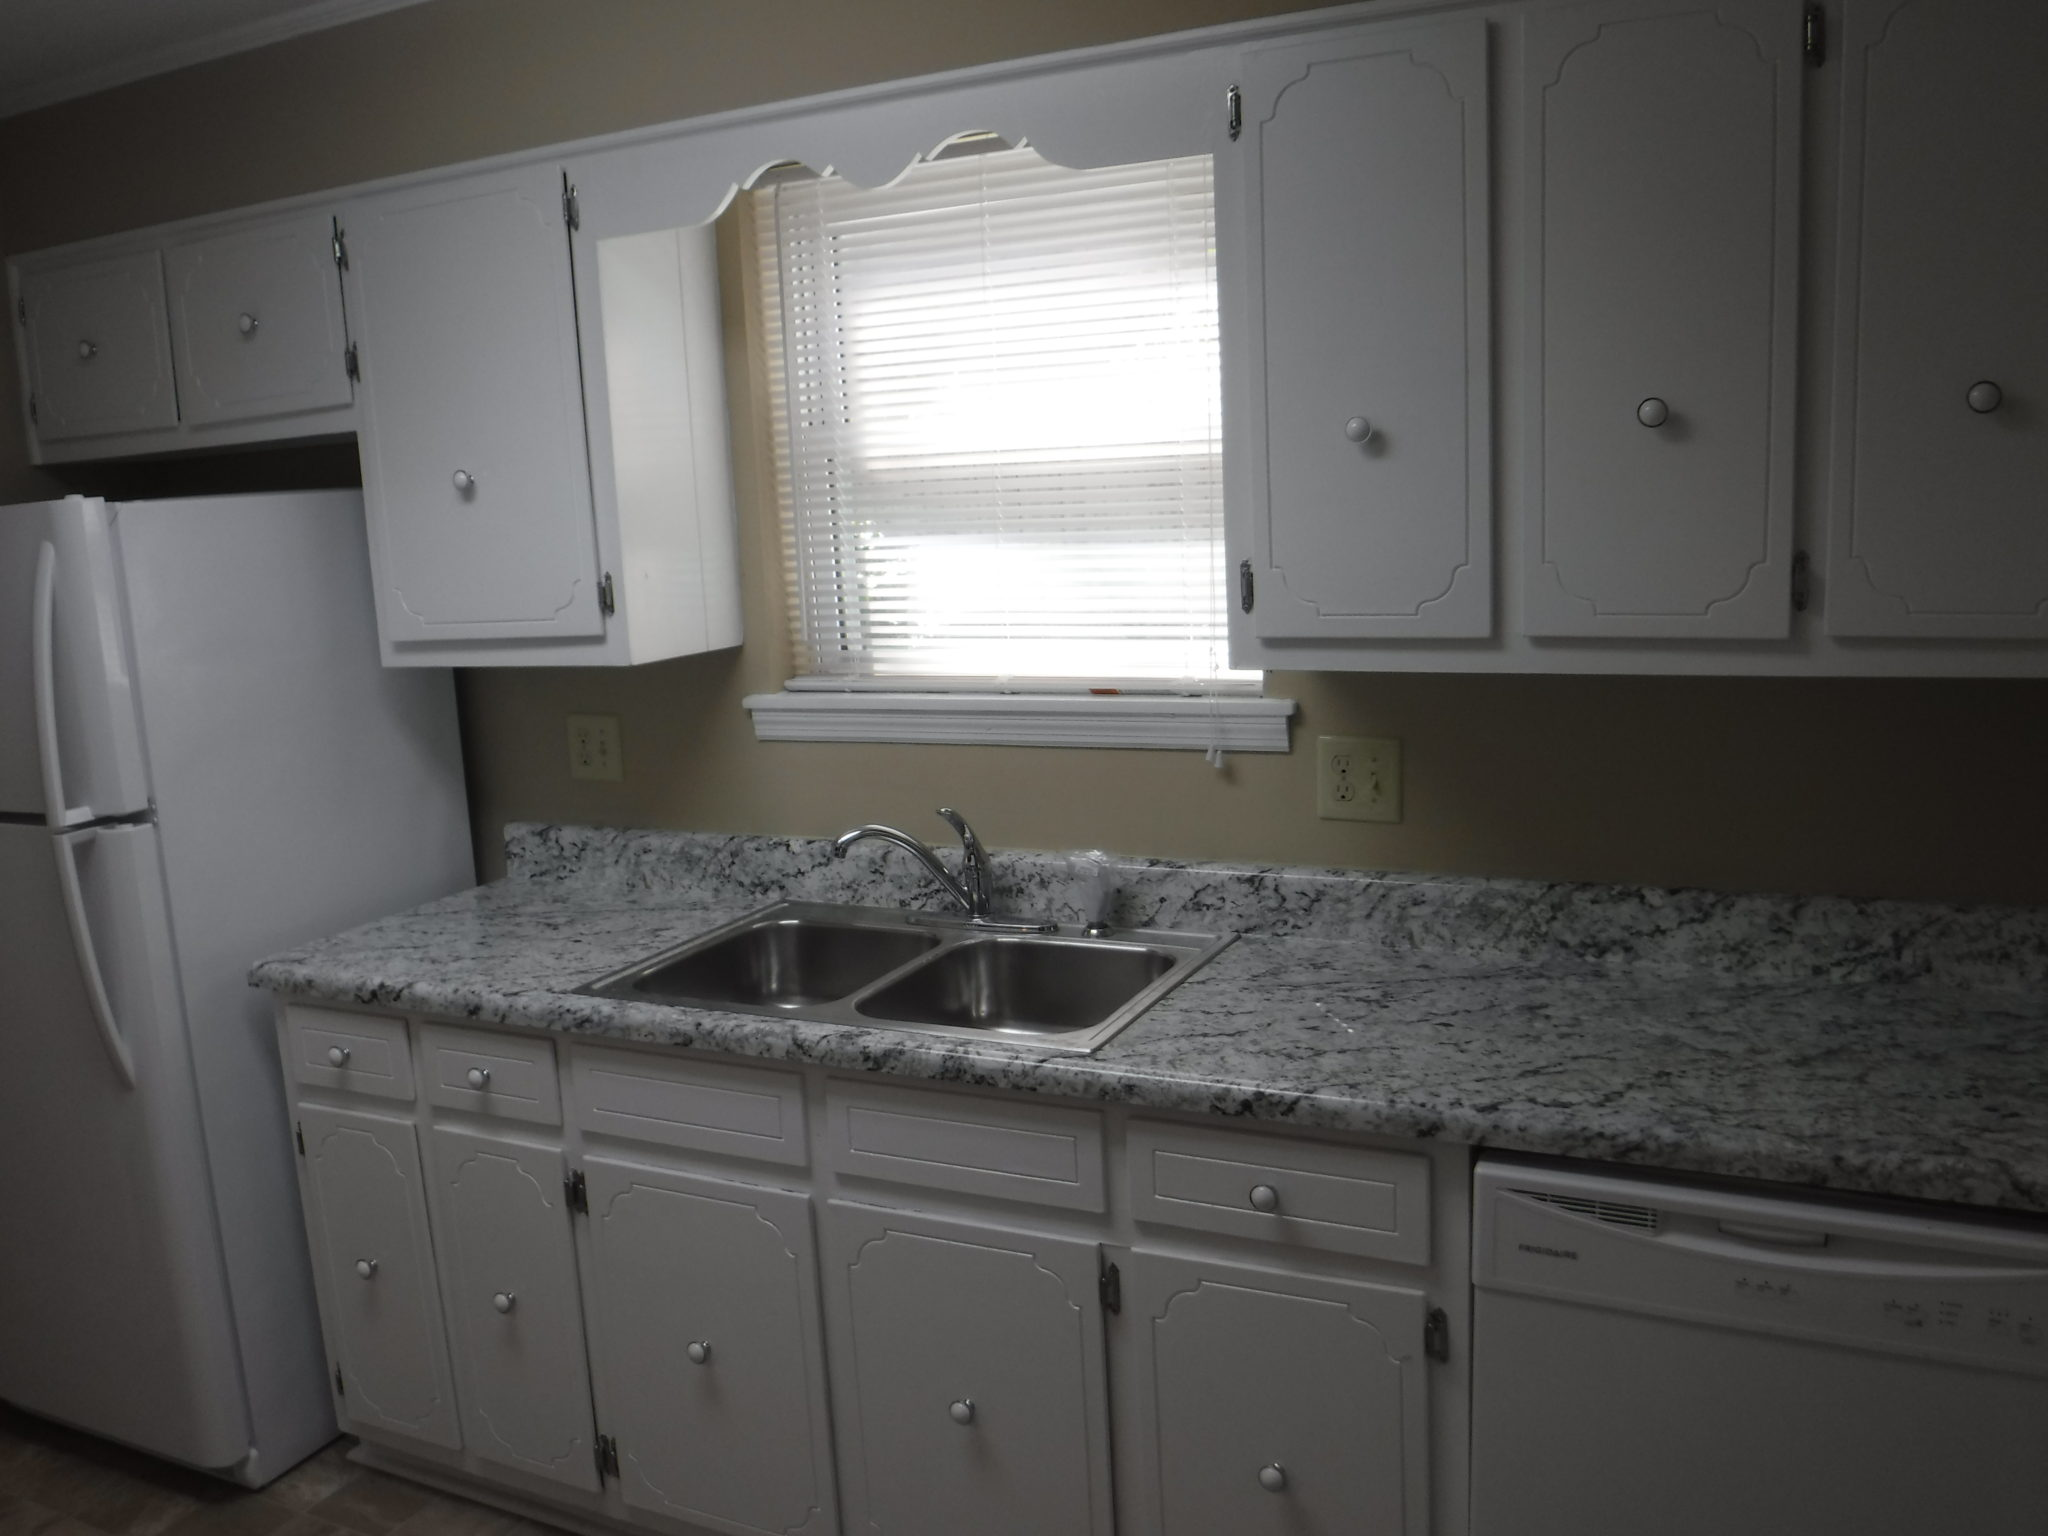 9 x 12 kitchen with new counter top and all new appliances rh veteransrealtyaugusta com 9x12 kitchen 9 x 12 kitchen designs